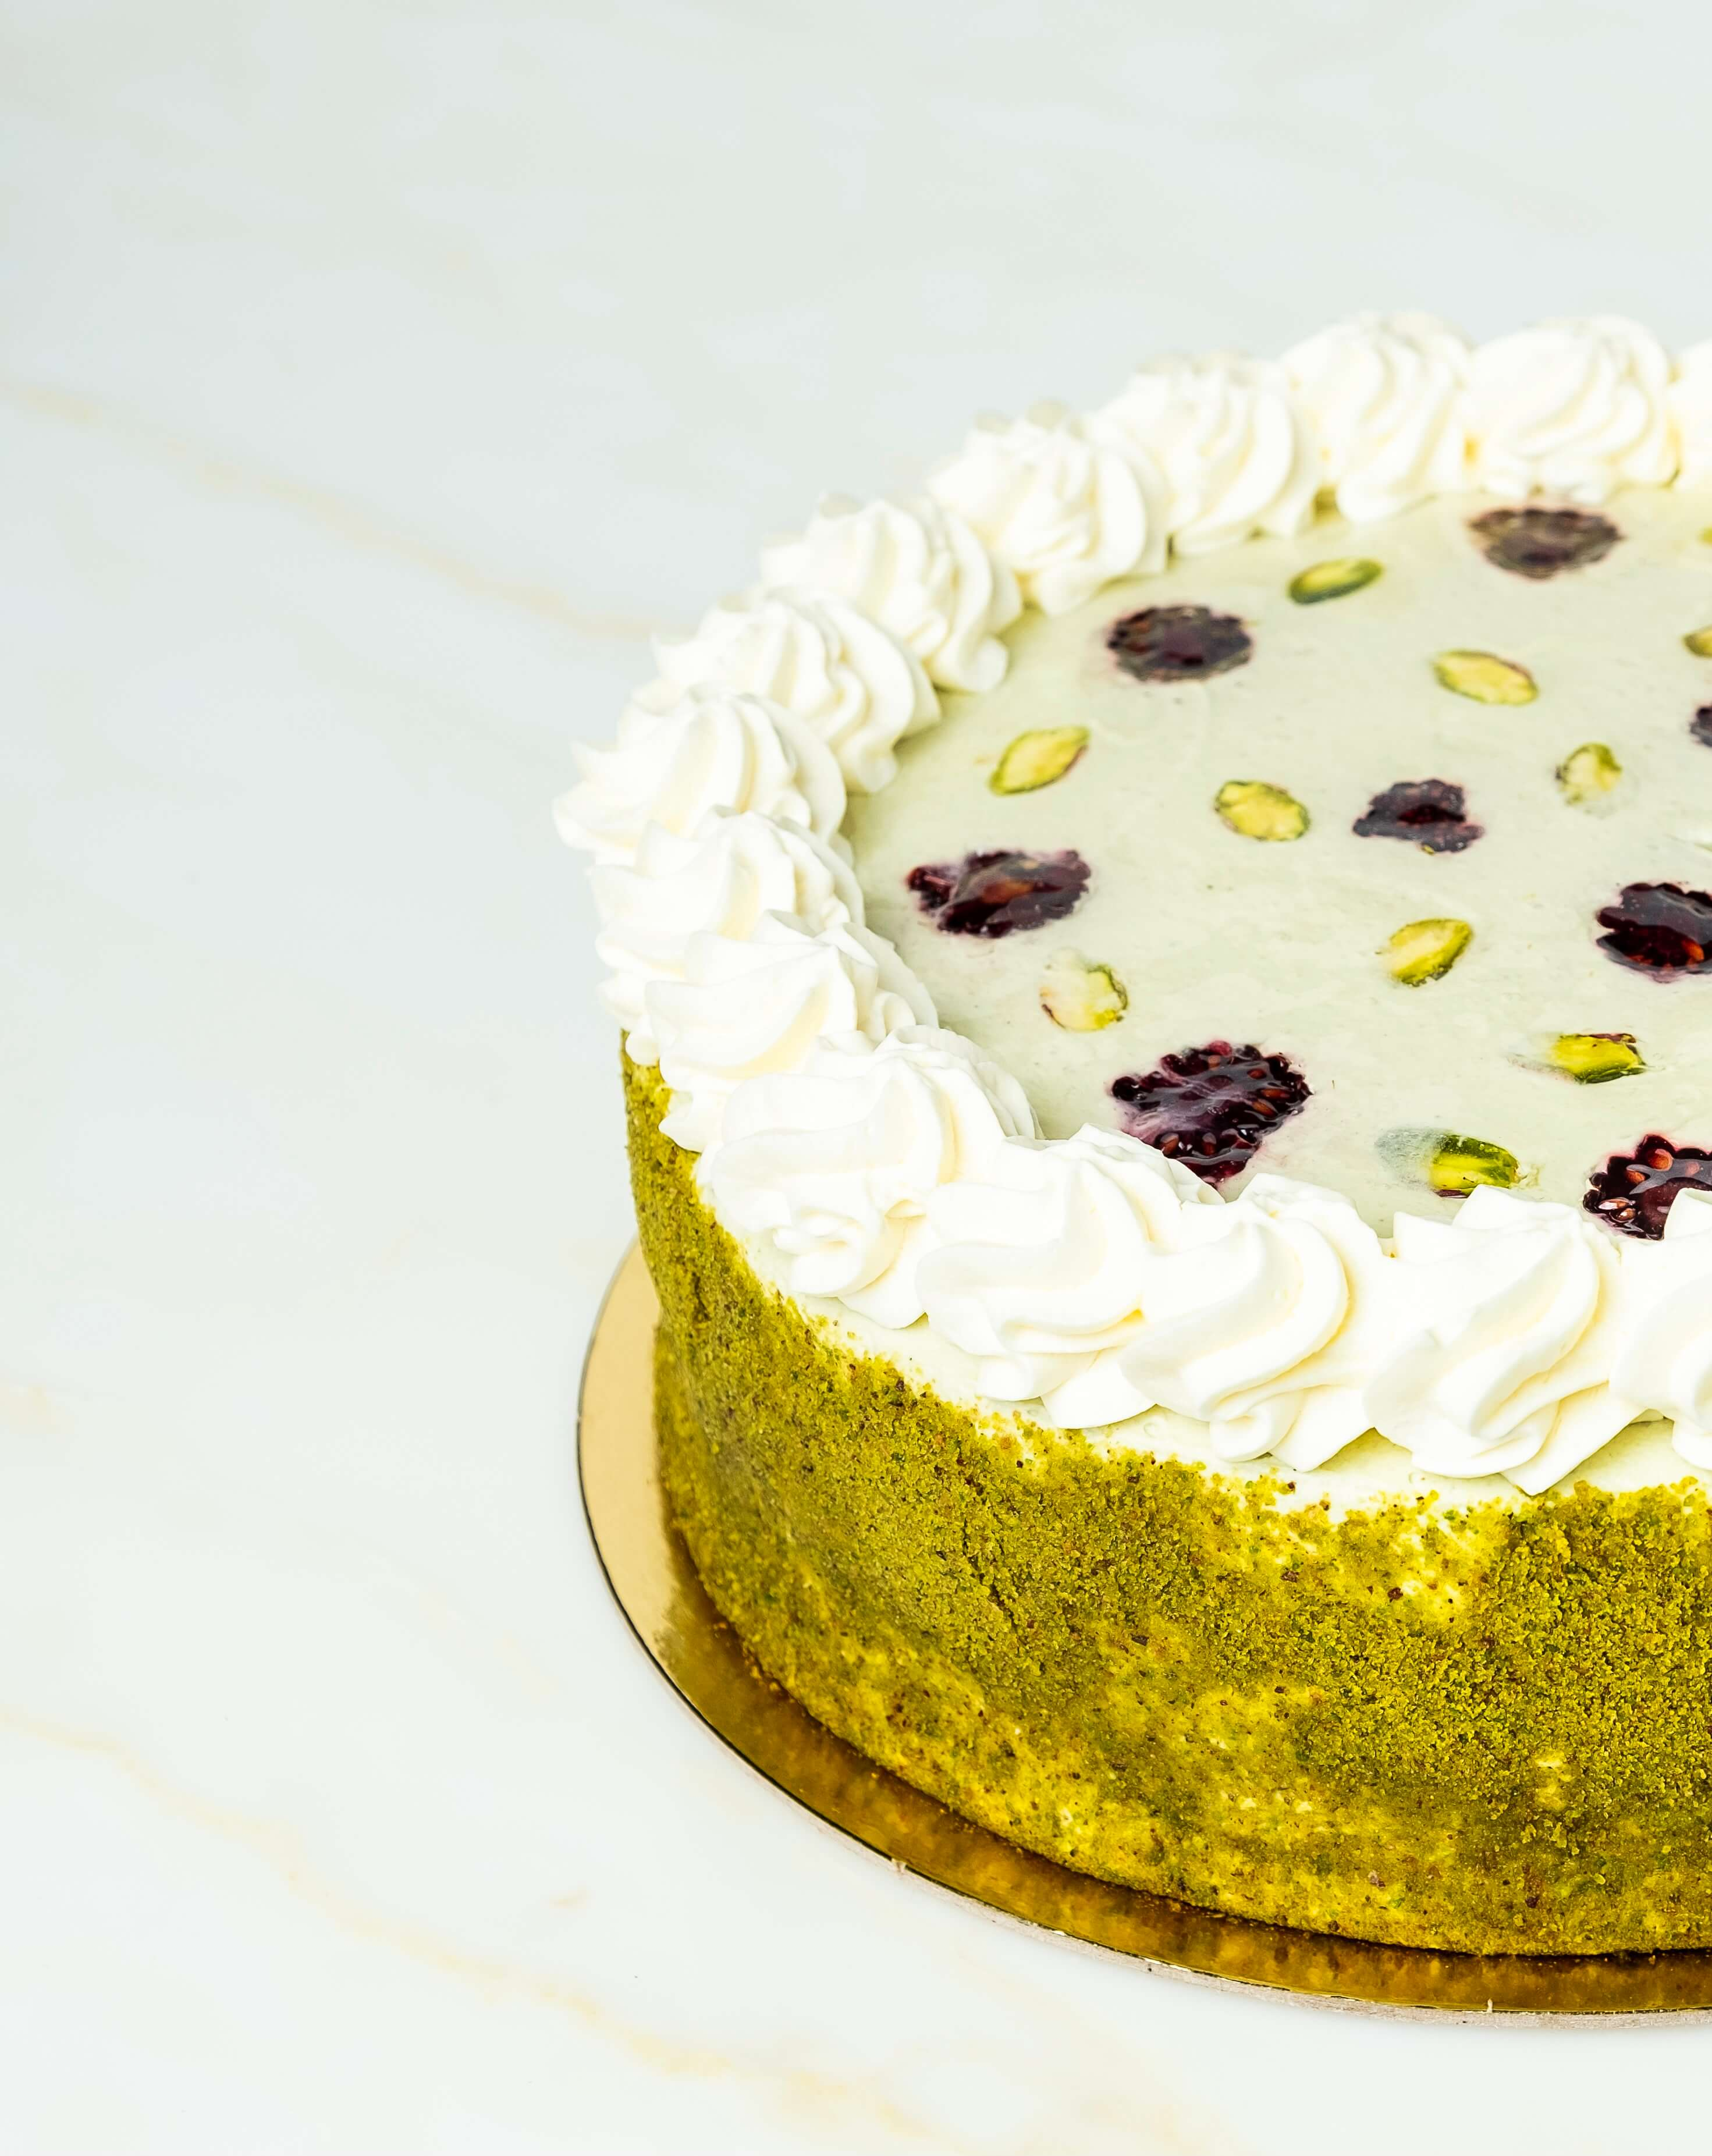 Pistachio Crunch cake